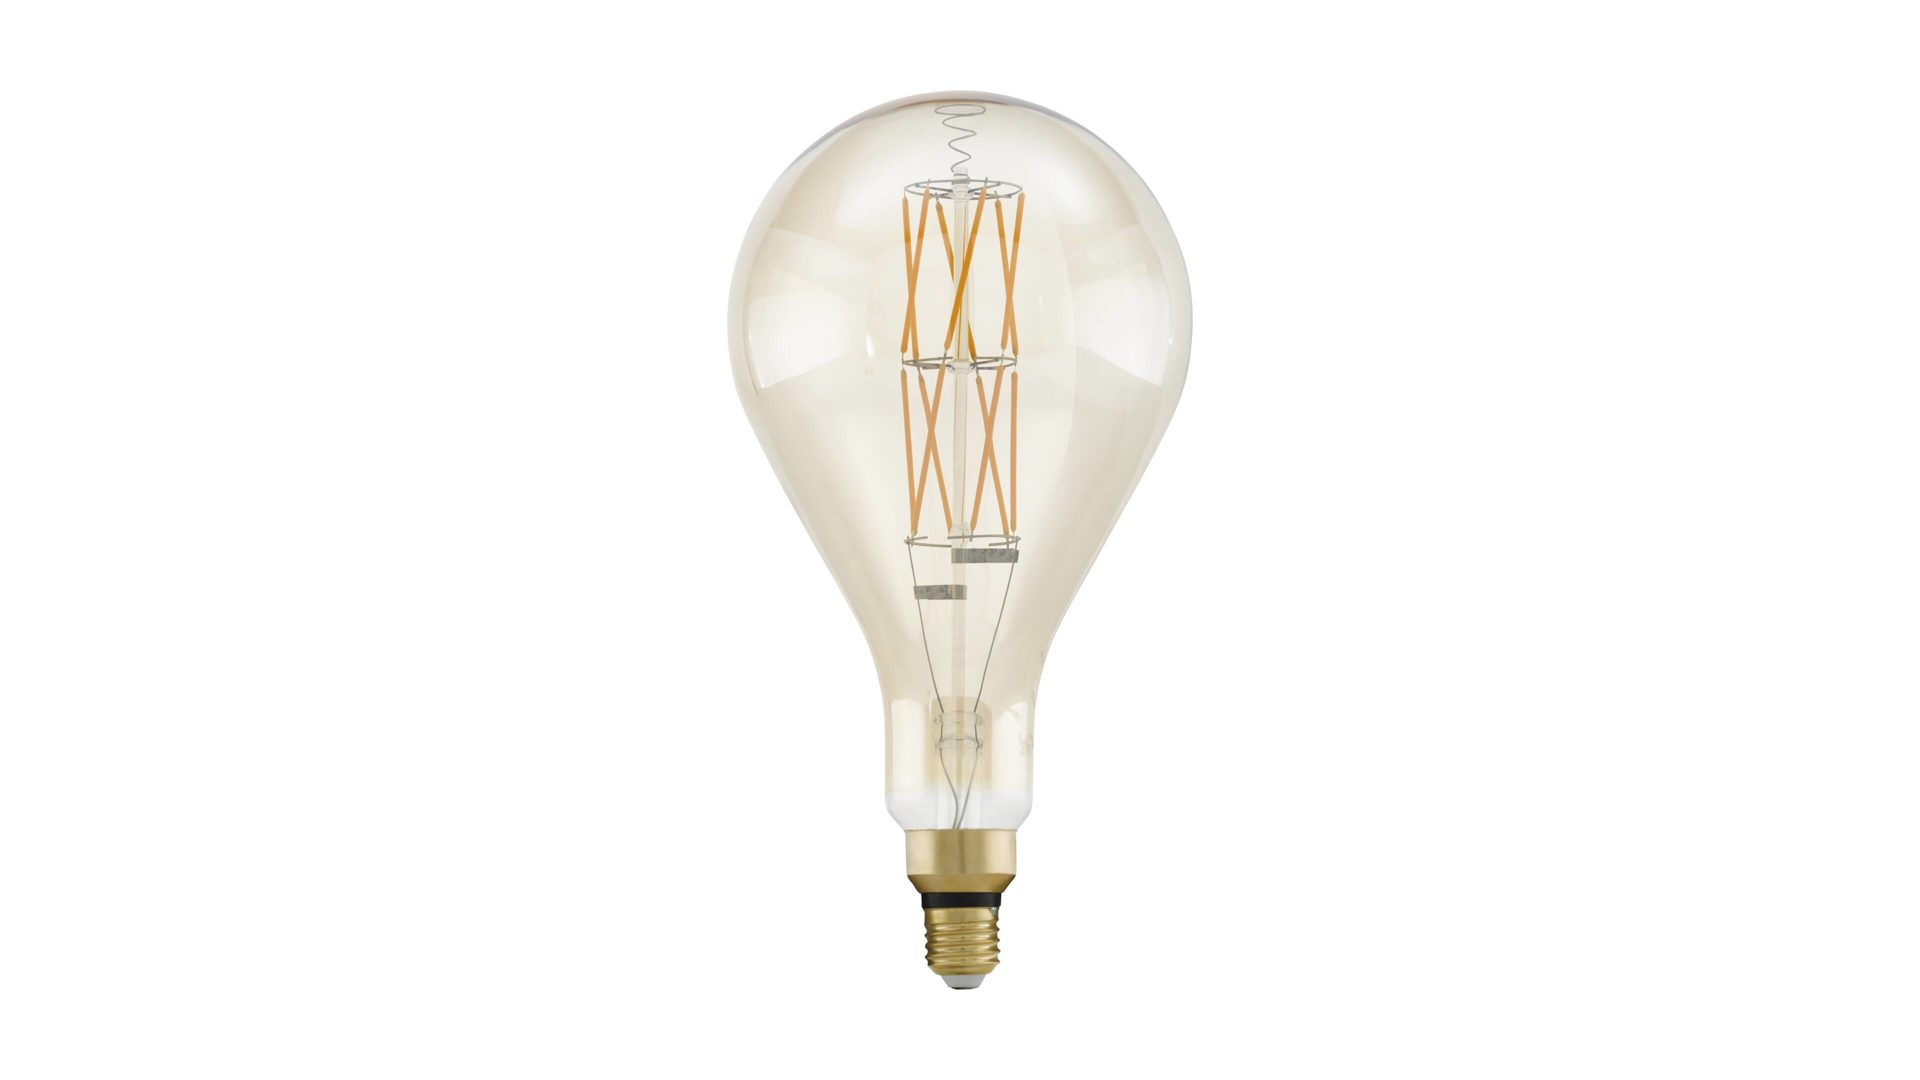 Möbel Bohn Crailsheim, EGLO LED Leuchtmittel, LED, EGLO